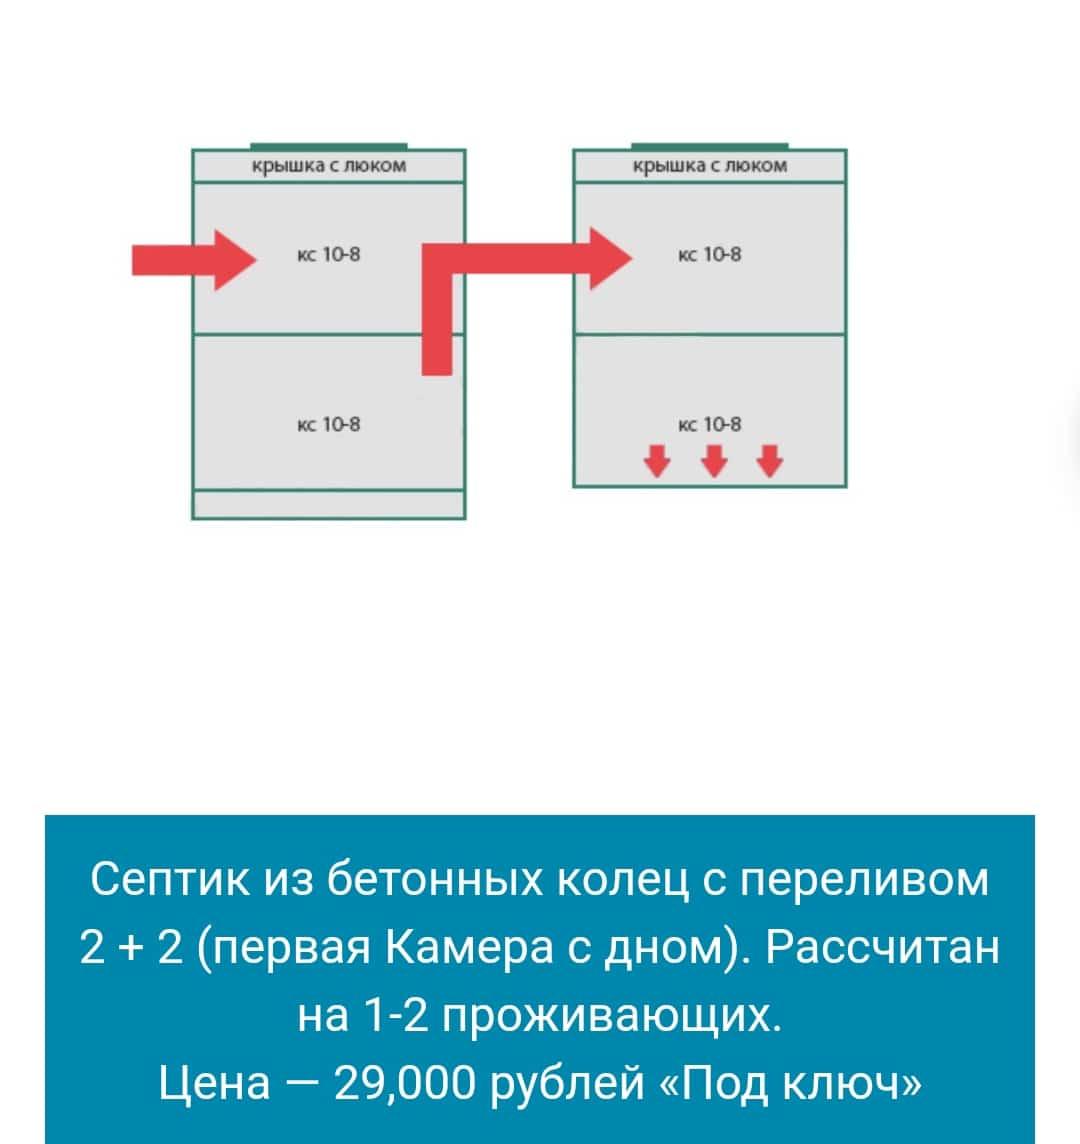 Септик из колец в Сергиево-Посаде и Сергиево-Посадском районе